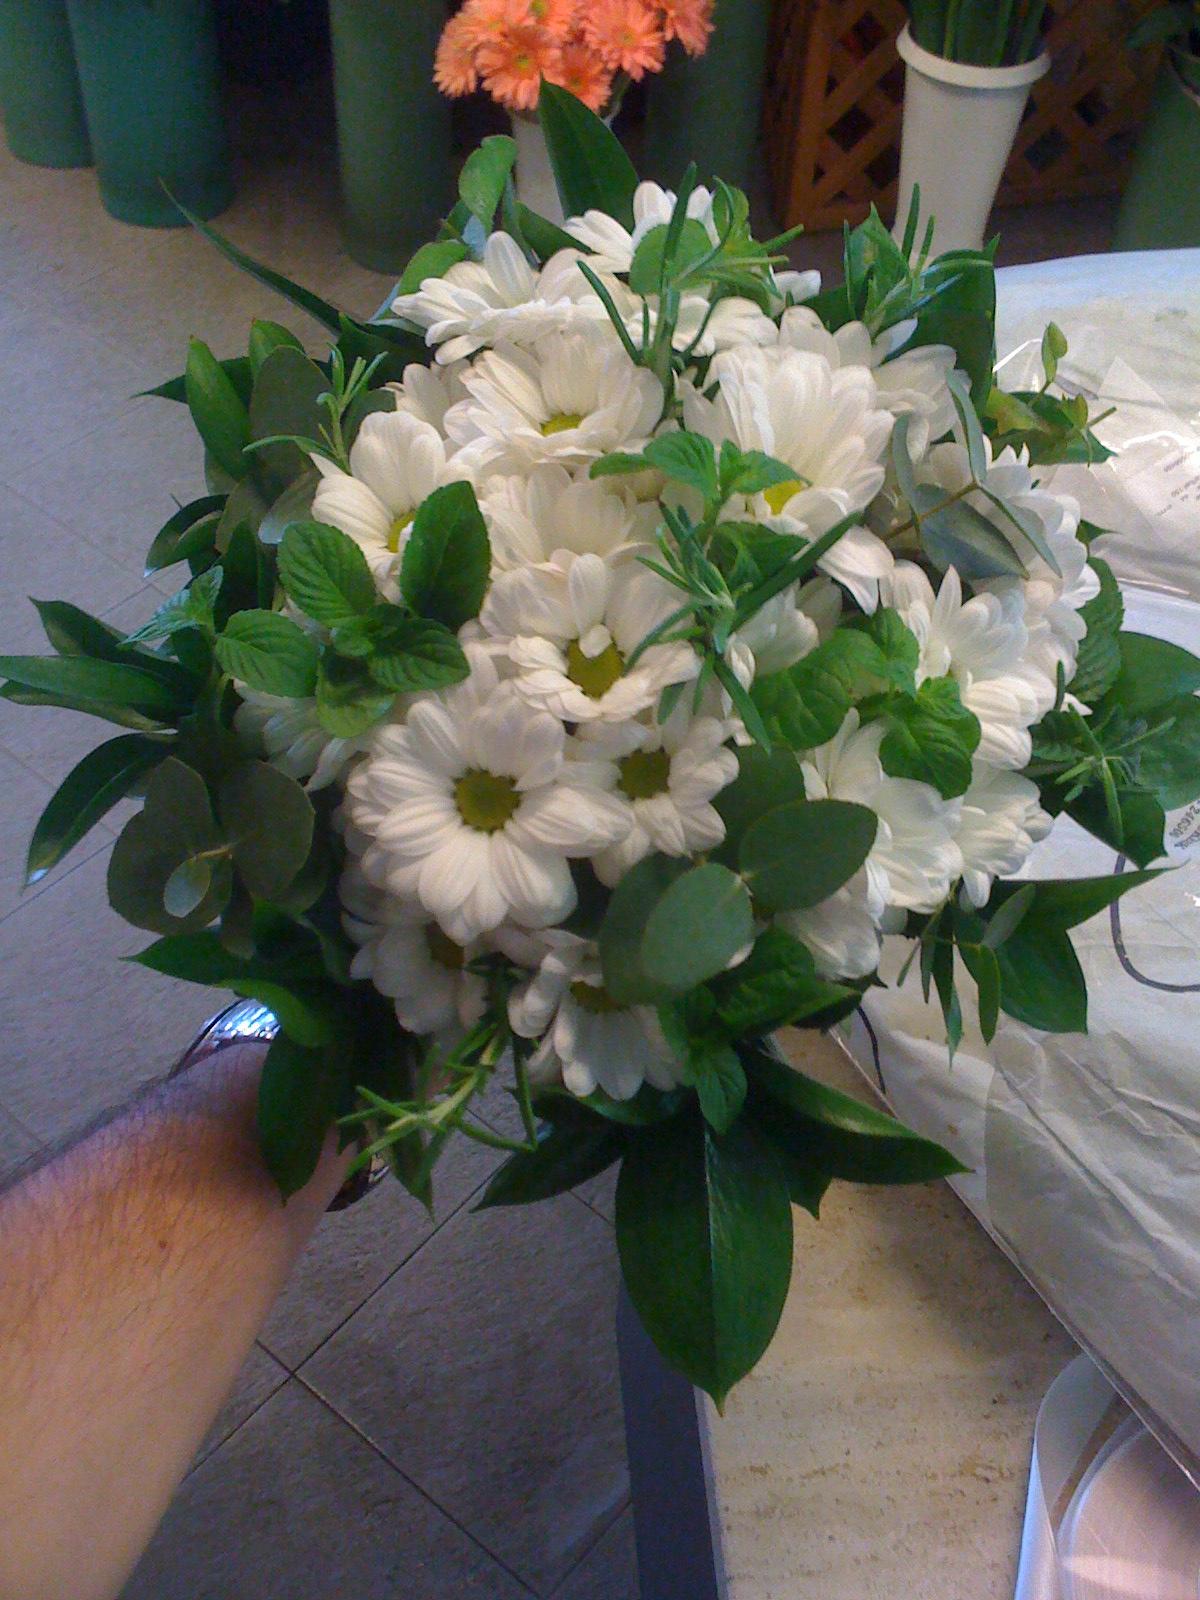 Matrimonio Tema Lavanda : Matrimonio aromatico